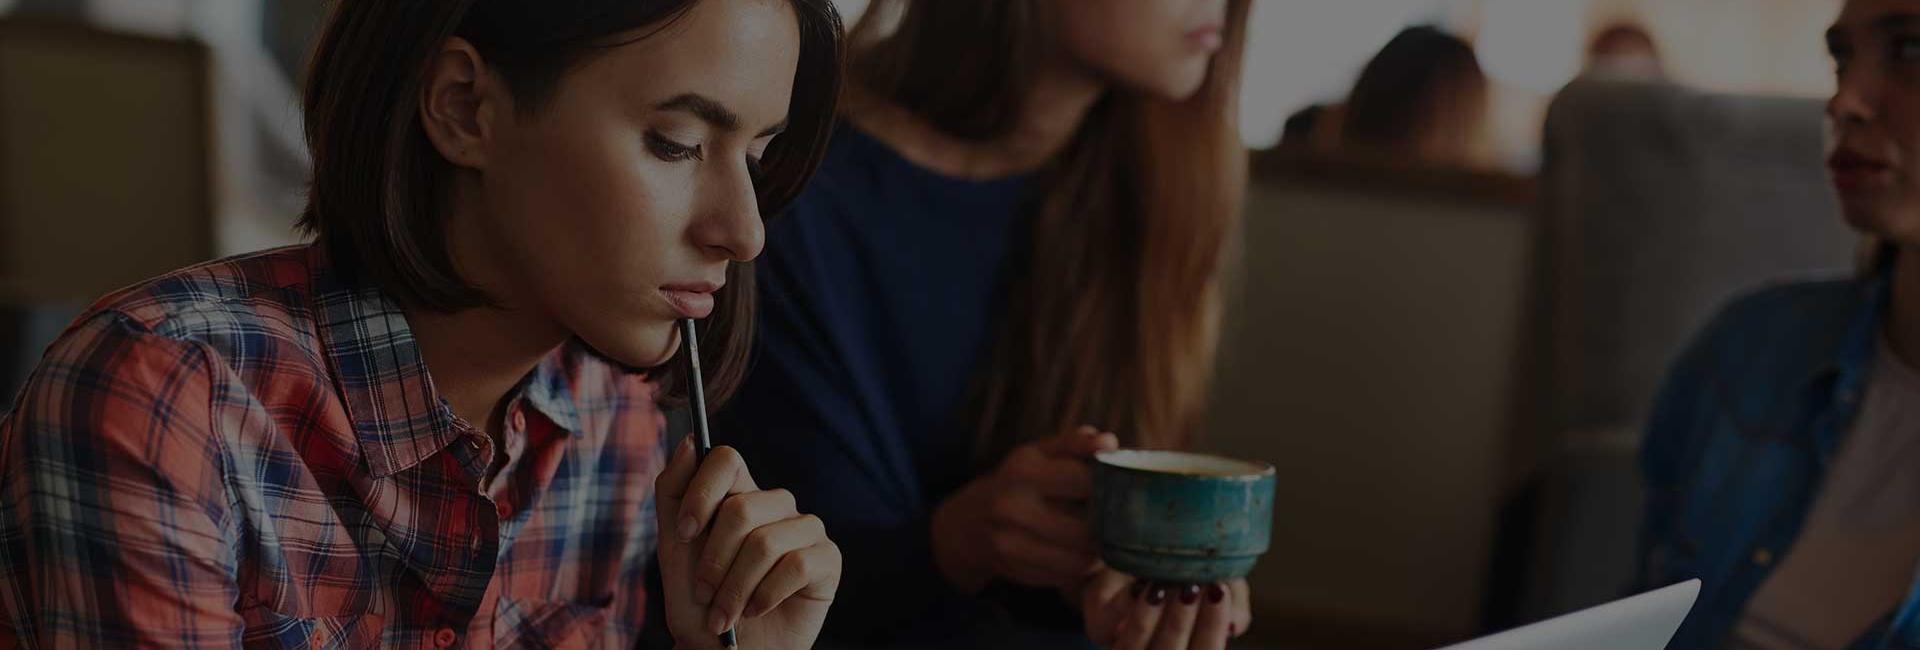 Pensive-Girl